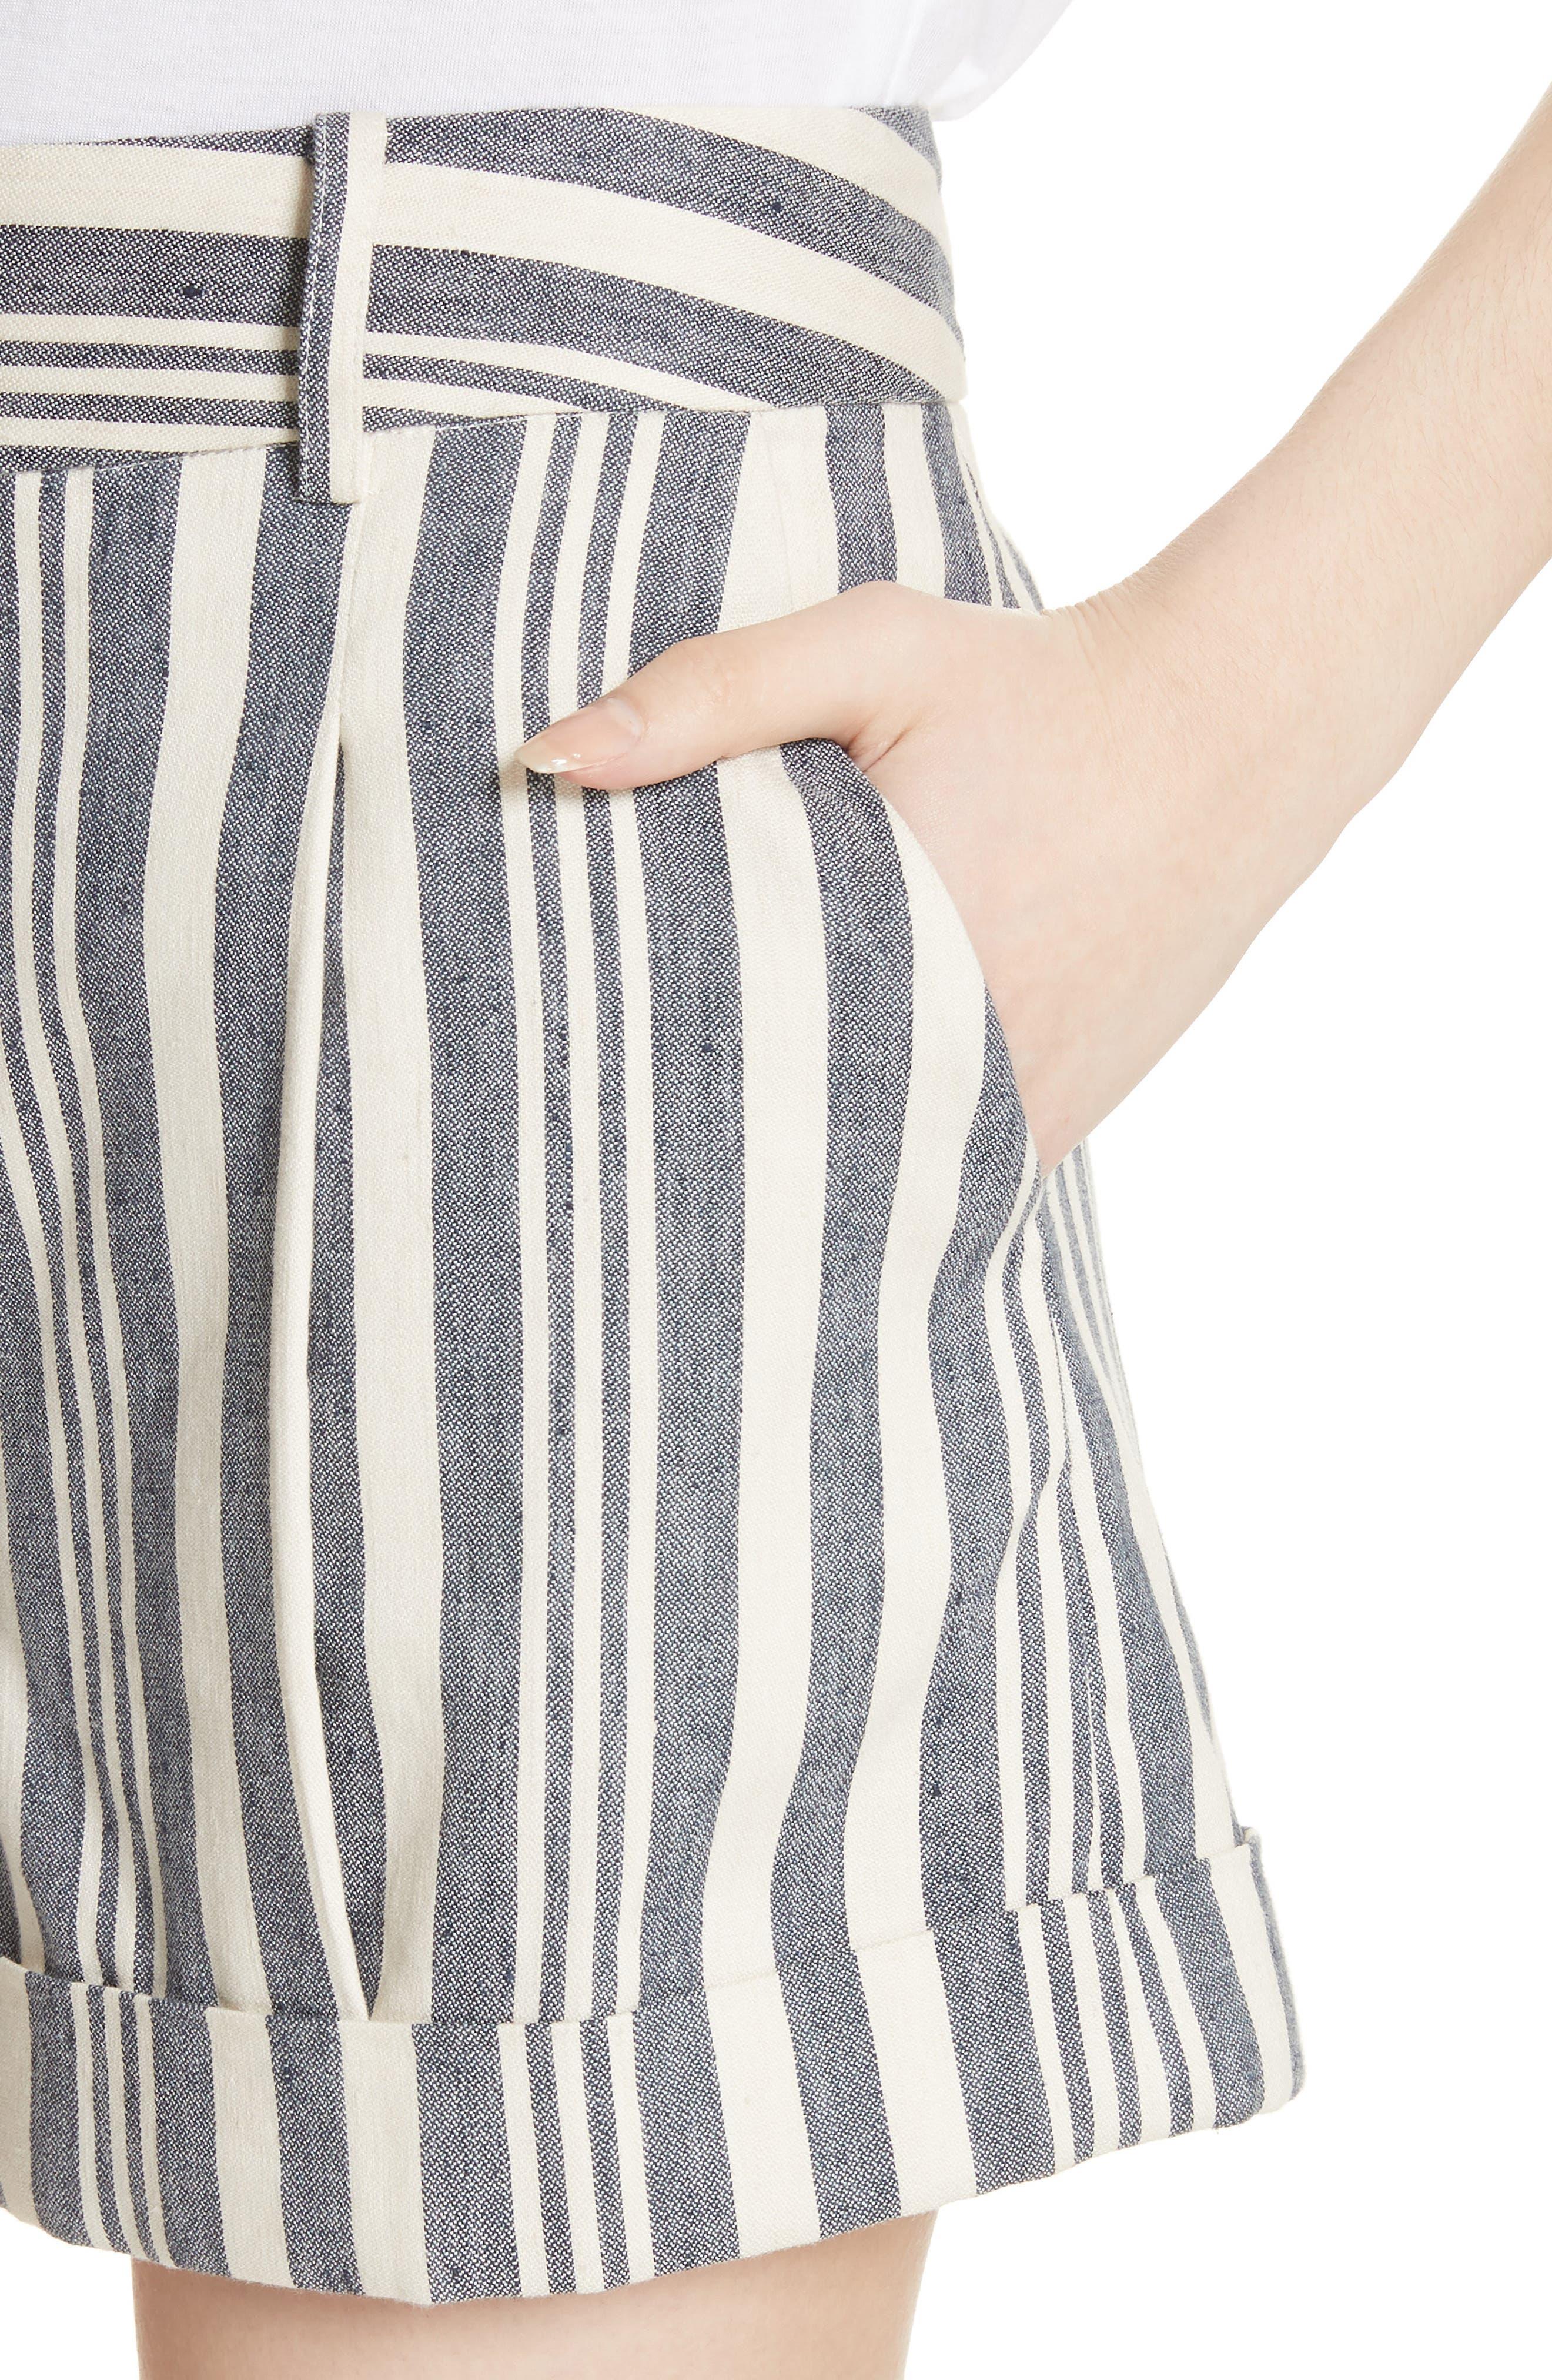 Carito Stripe Linen & Cotton Shorts,                             Alternate thumbnail 4, color,                             413